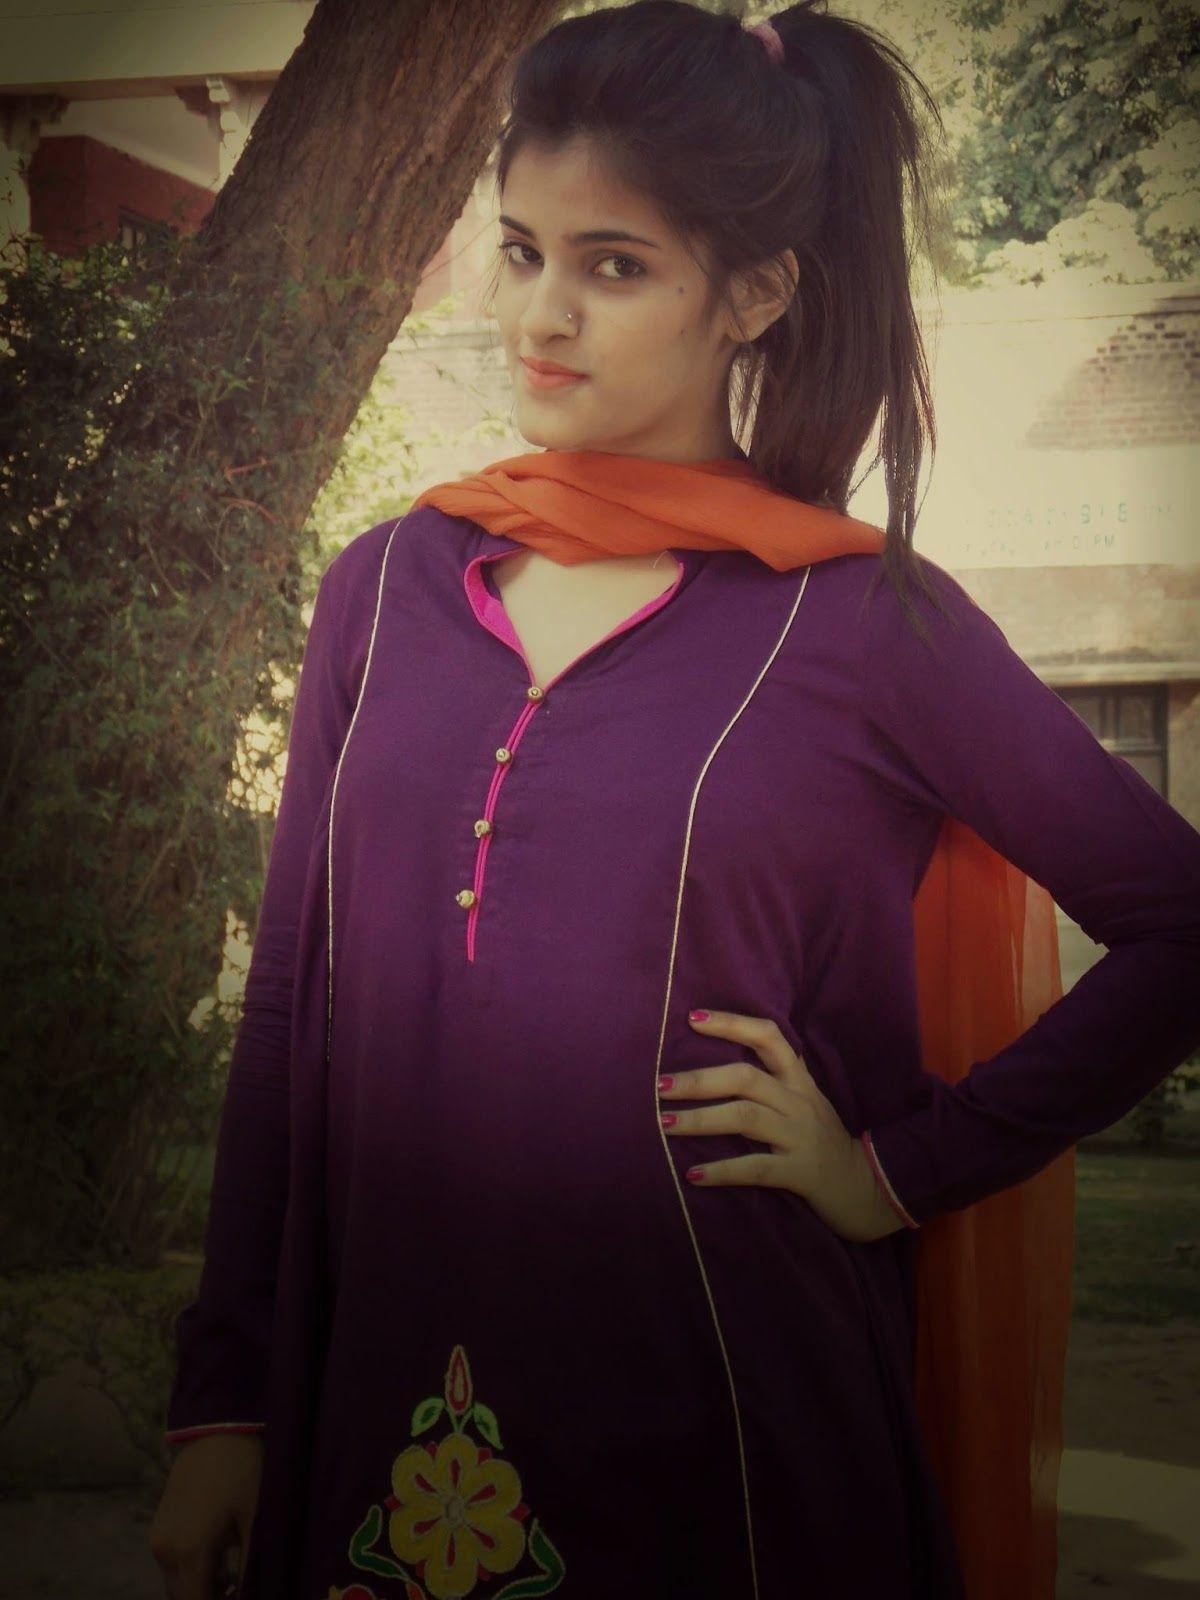 Cute belle ragazze pakistane nuove foto ragazze Desi-6870